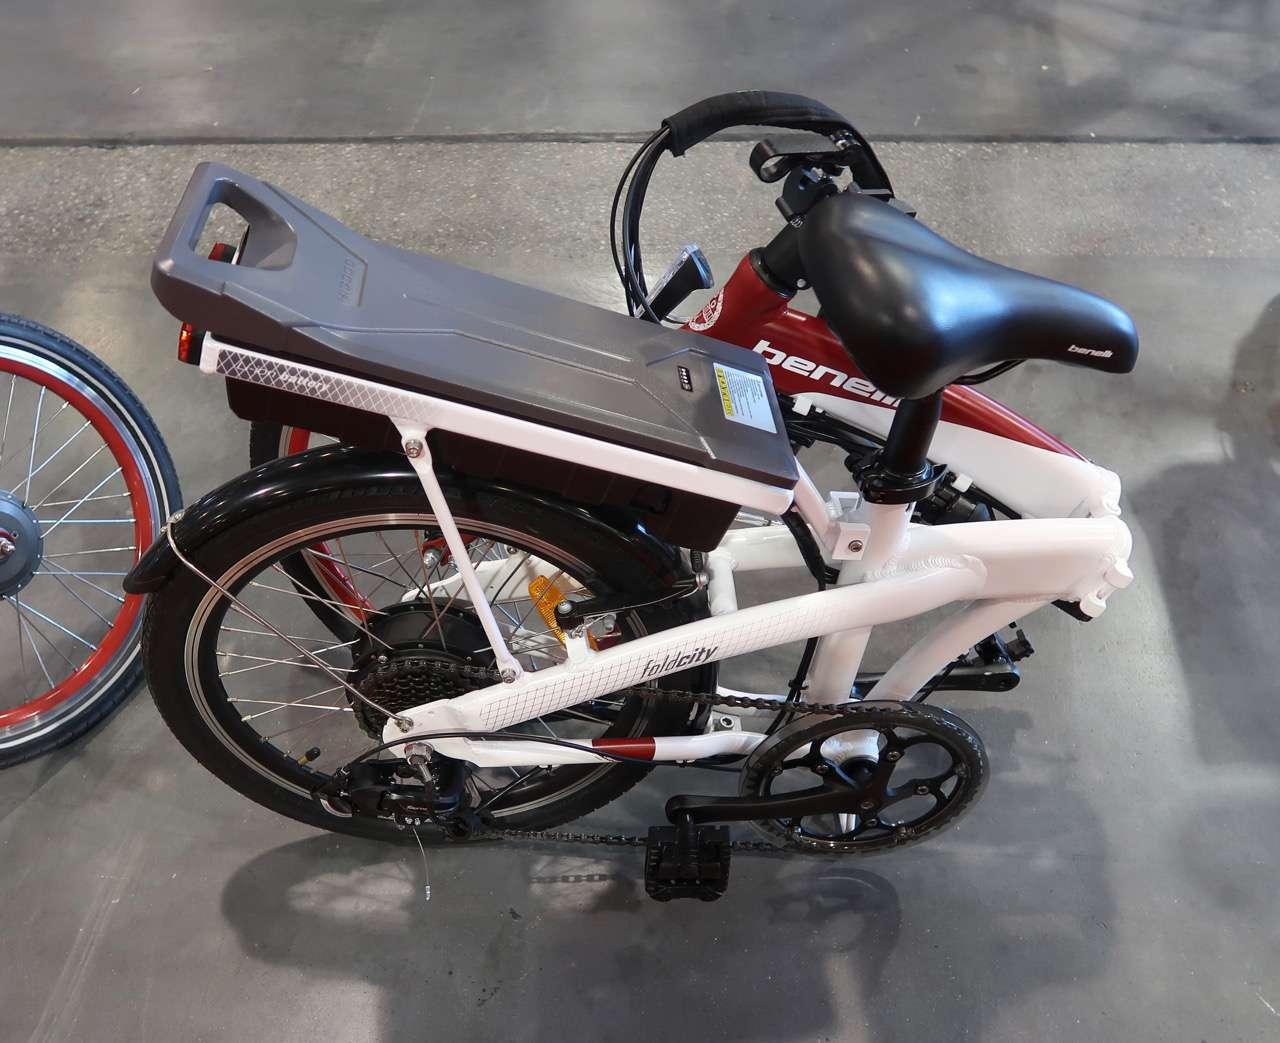 Benelli folding bike